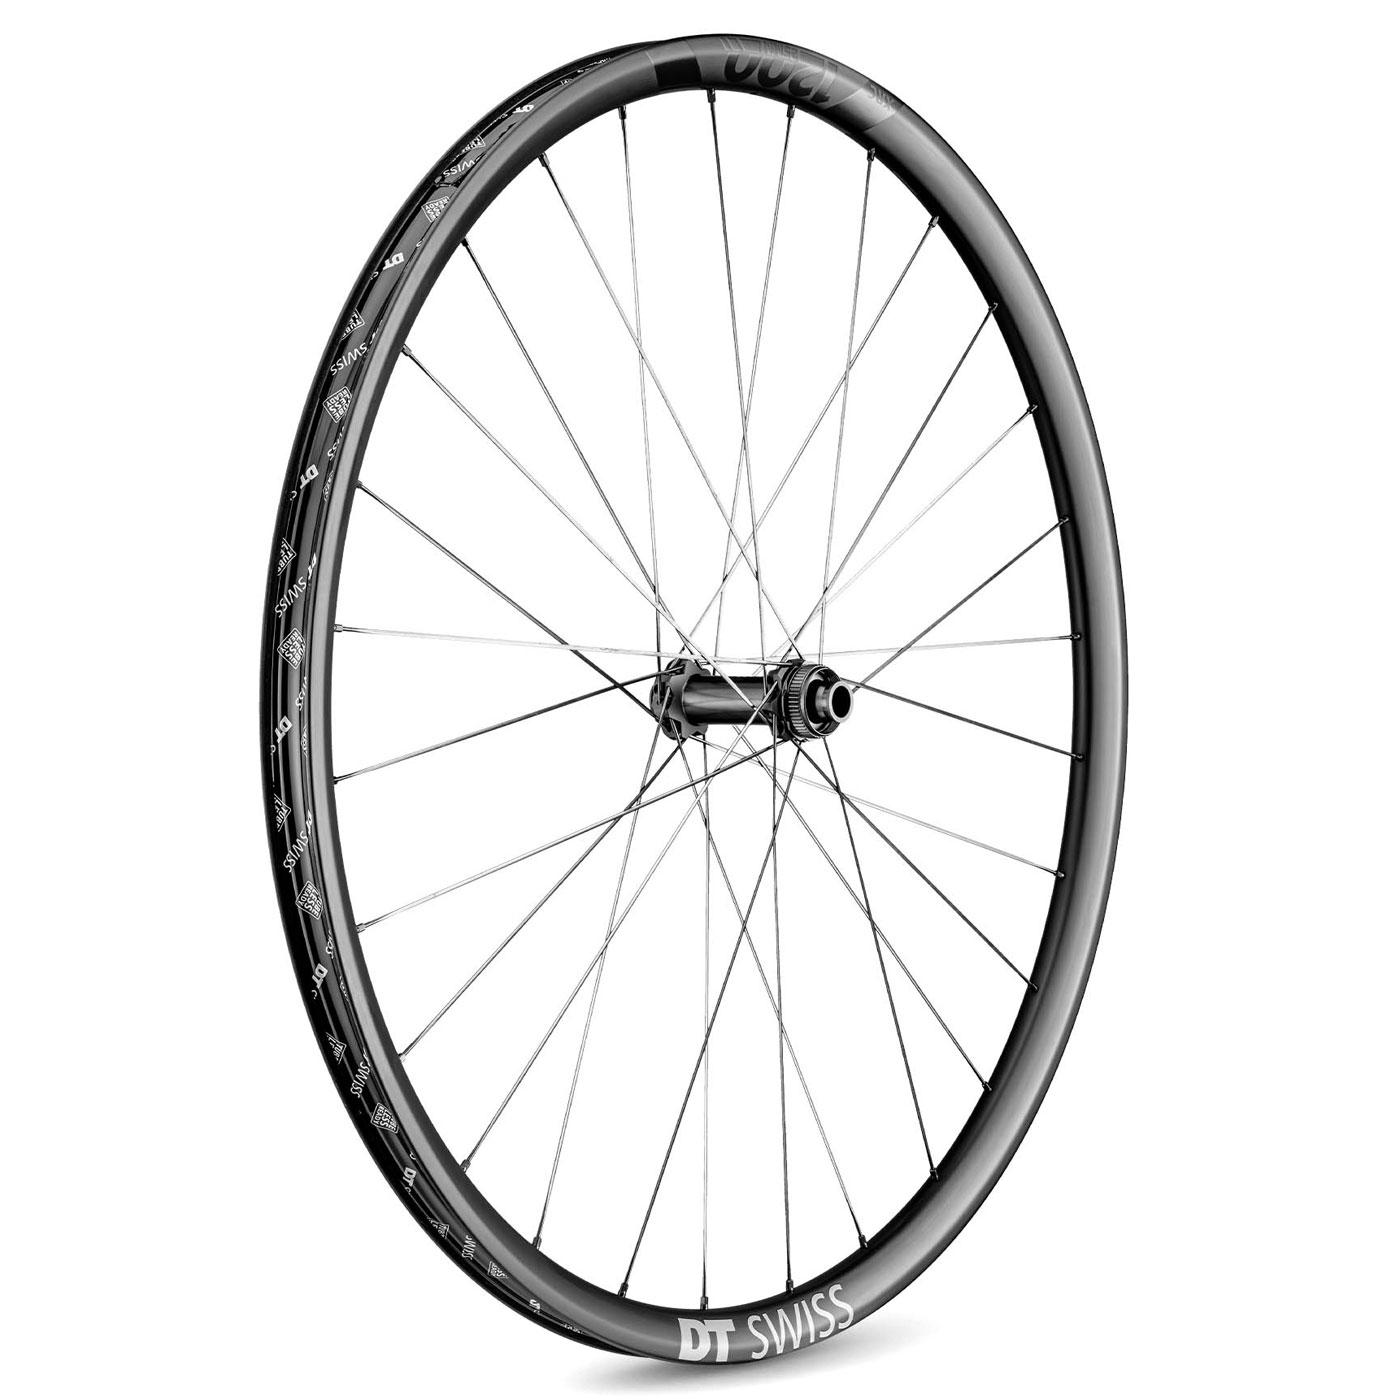 "DT Swiss XRC 1200 SPLINE 25 - Carbon - 29"" Front Wheel - Clincher - Centerlock / 6-bolt - 15x110mm Boost"